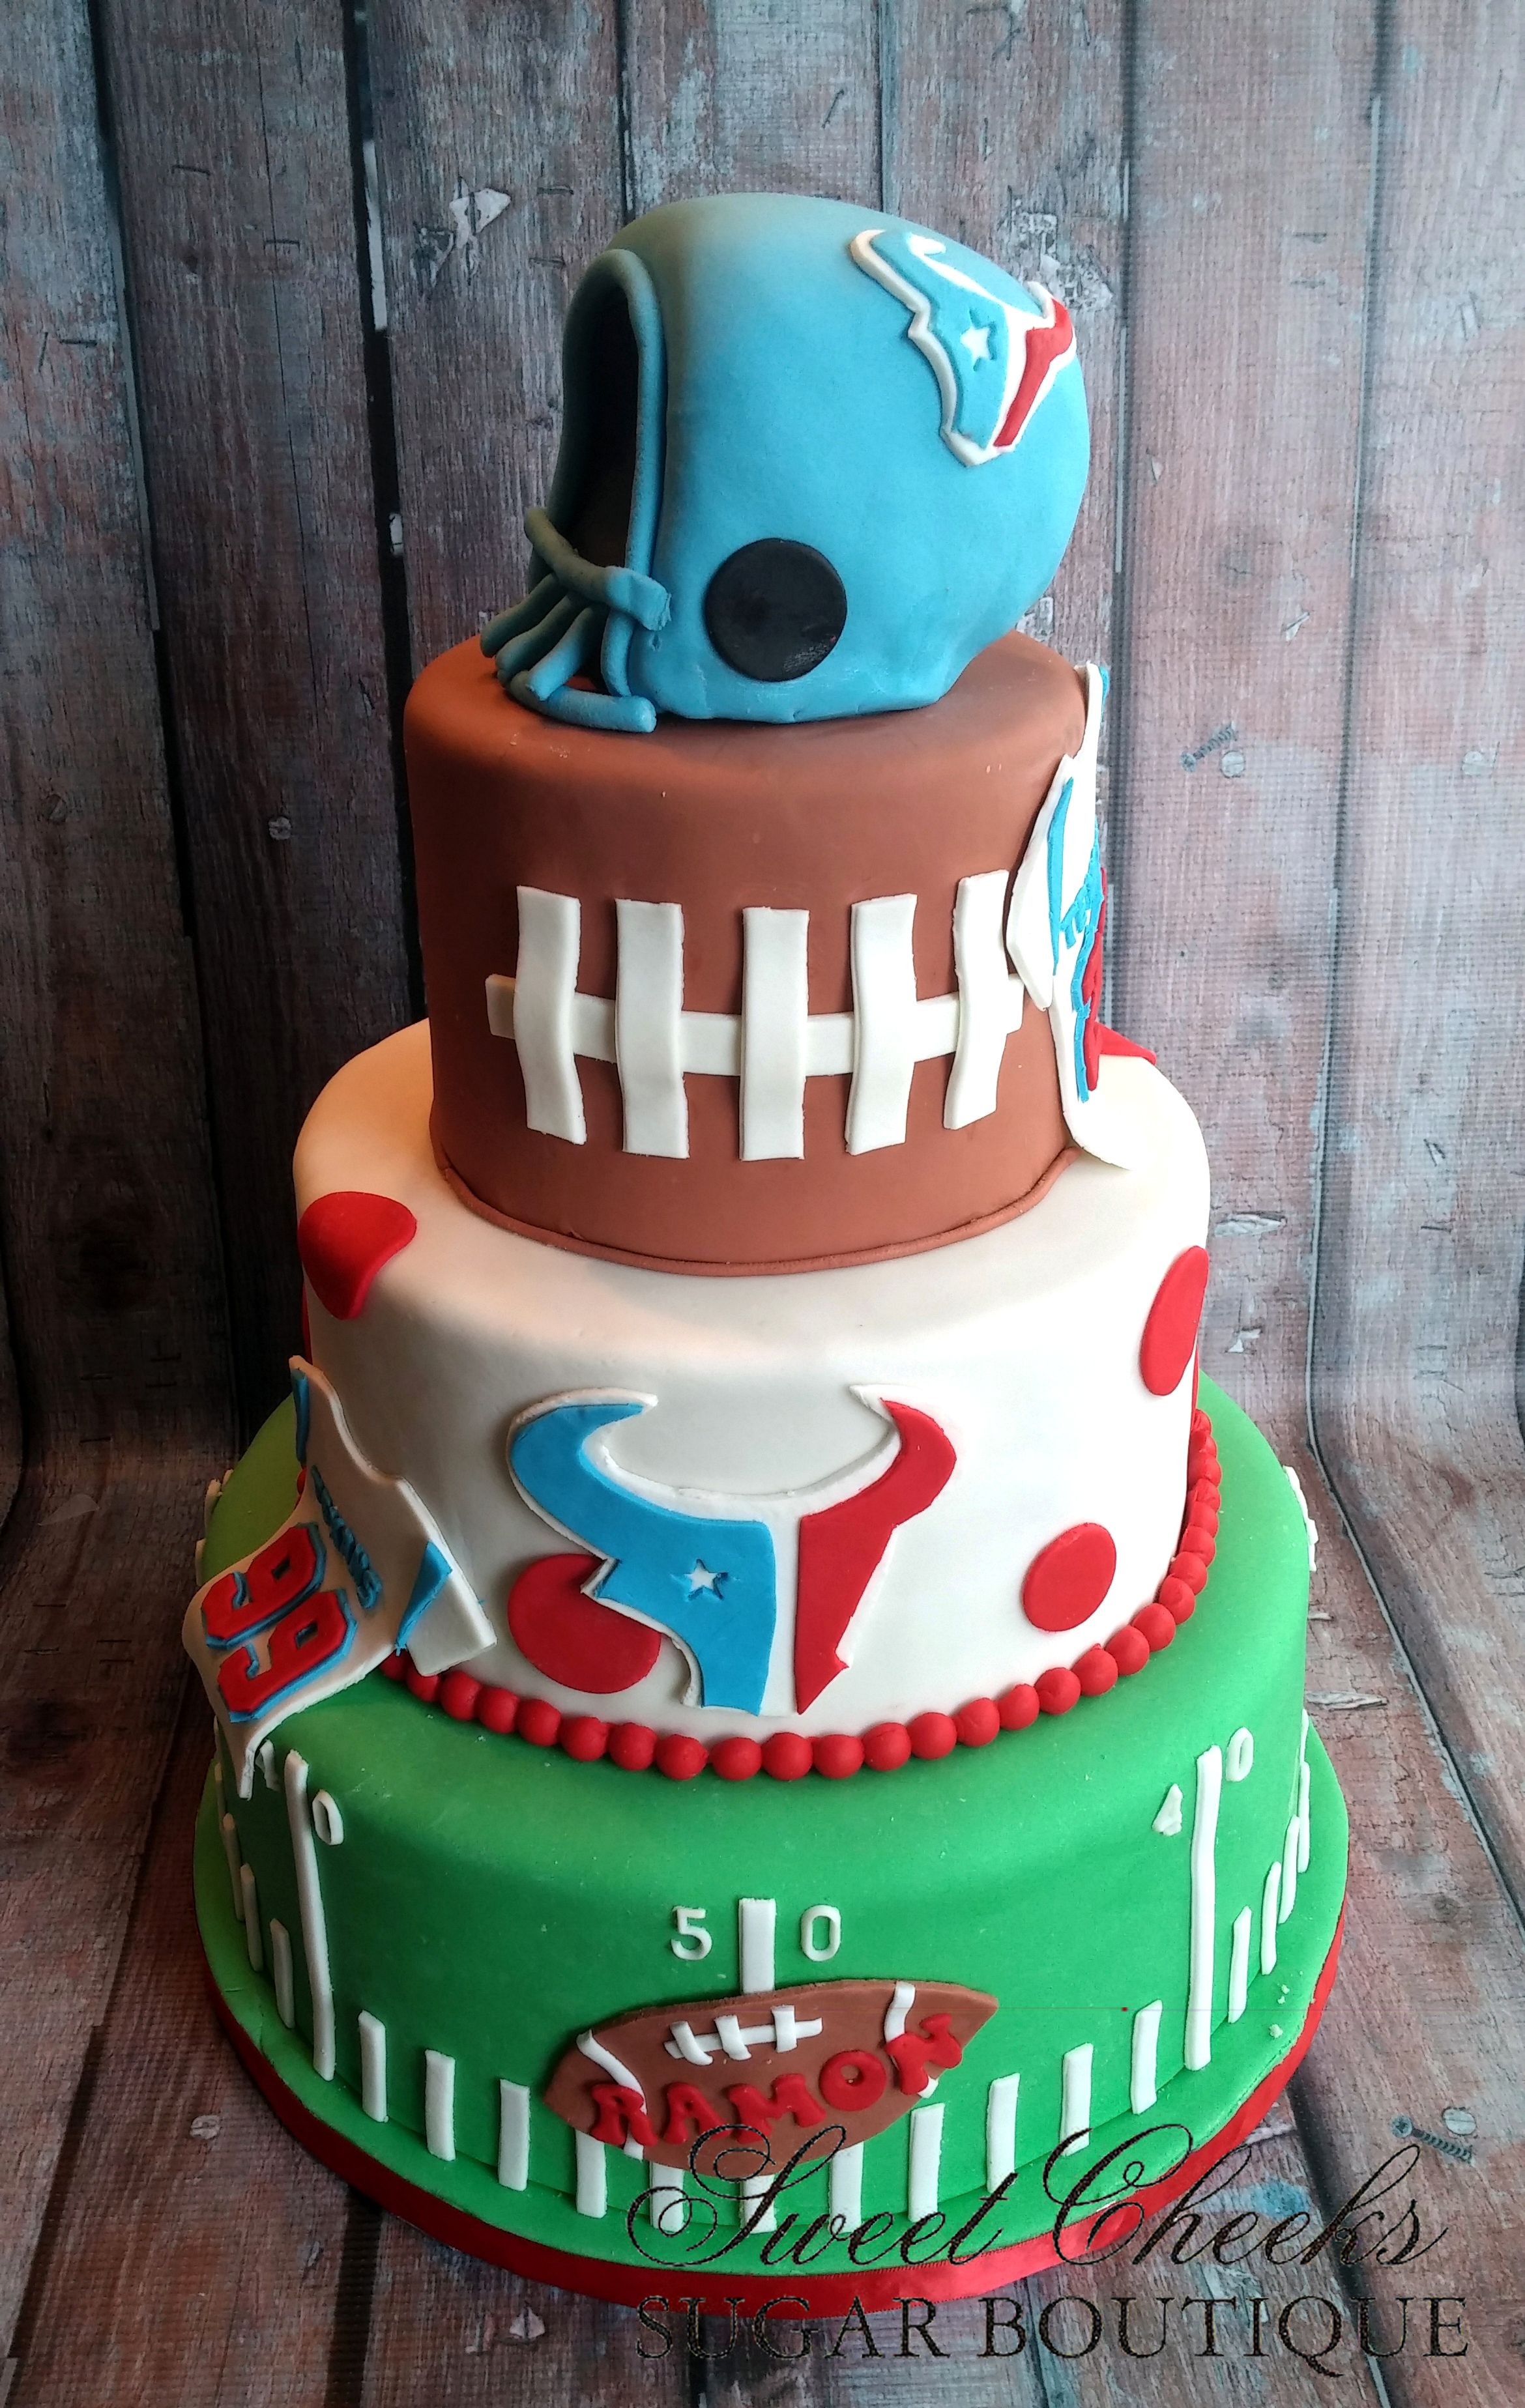 A Texans Themed Birthday Cake For Ramon Happy Birthday Sweet